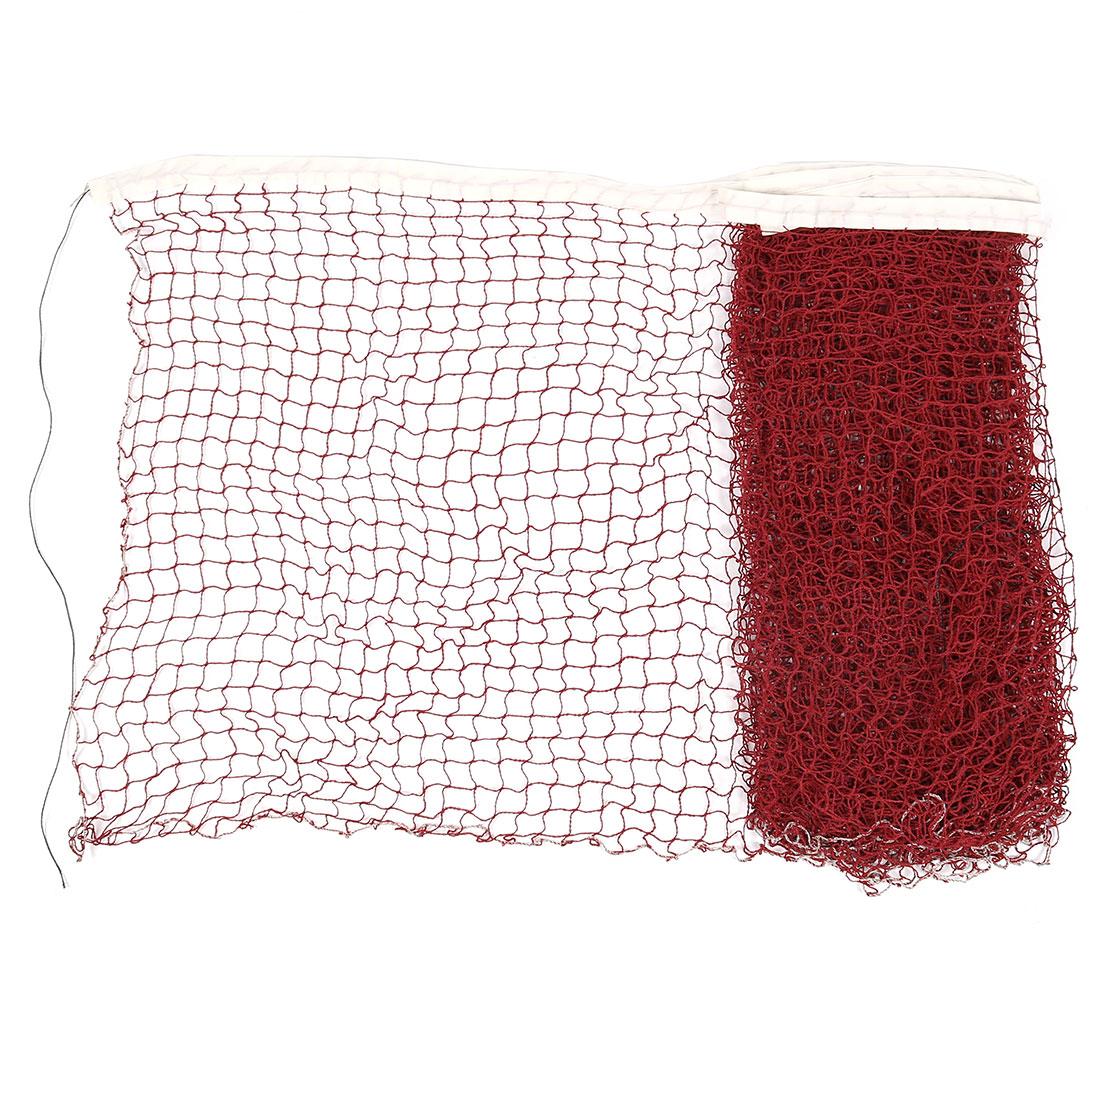 6 x 0.7M Nylon White Trim Burgundy Braided Mesh Badminton Training Net